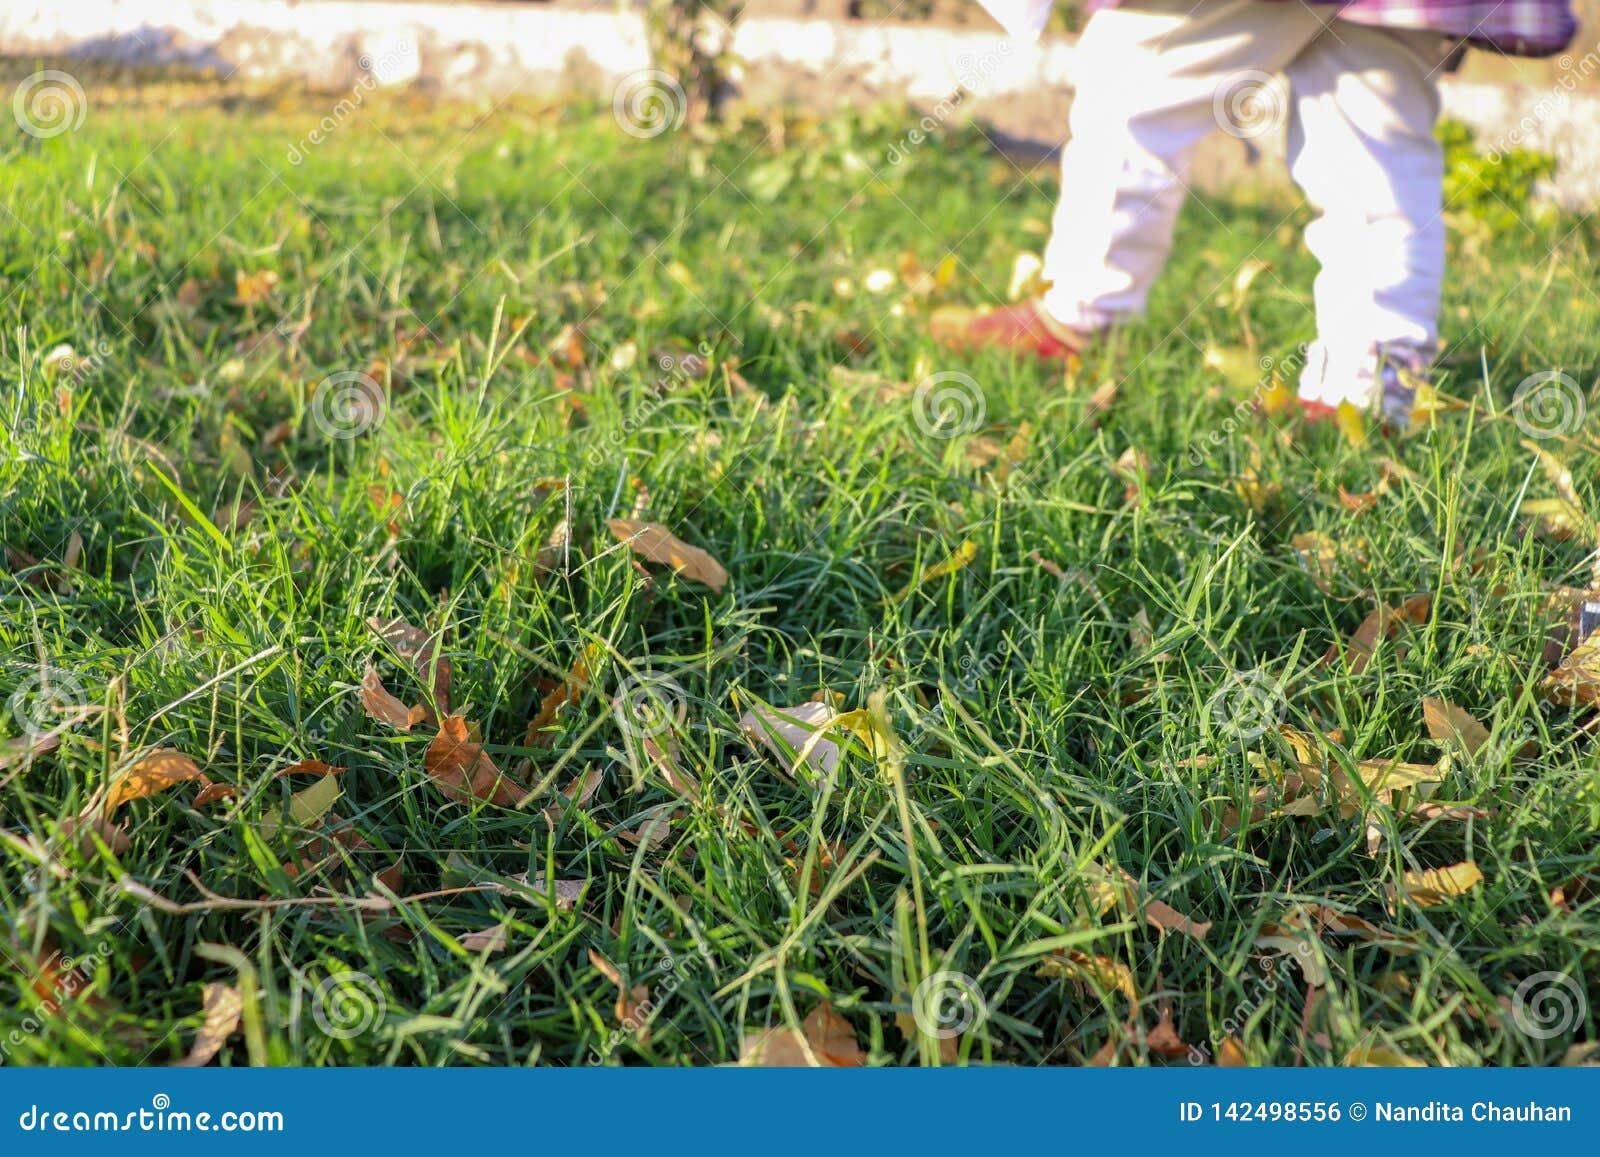 Little girl walking on the green grass in a park wearing white leggings